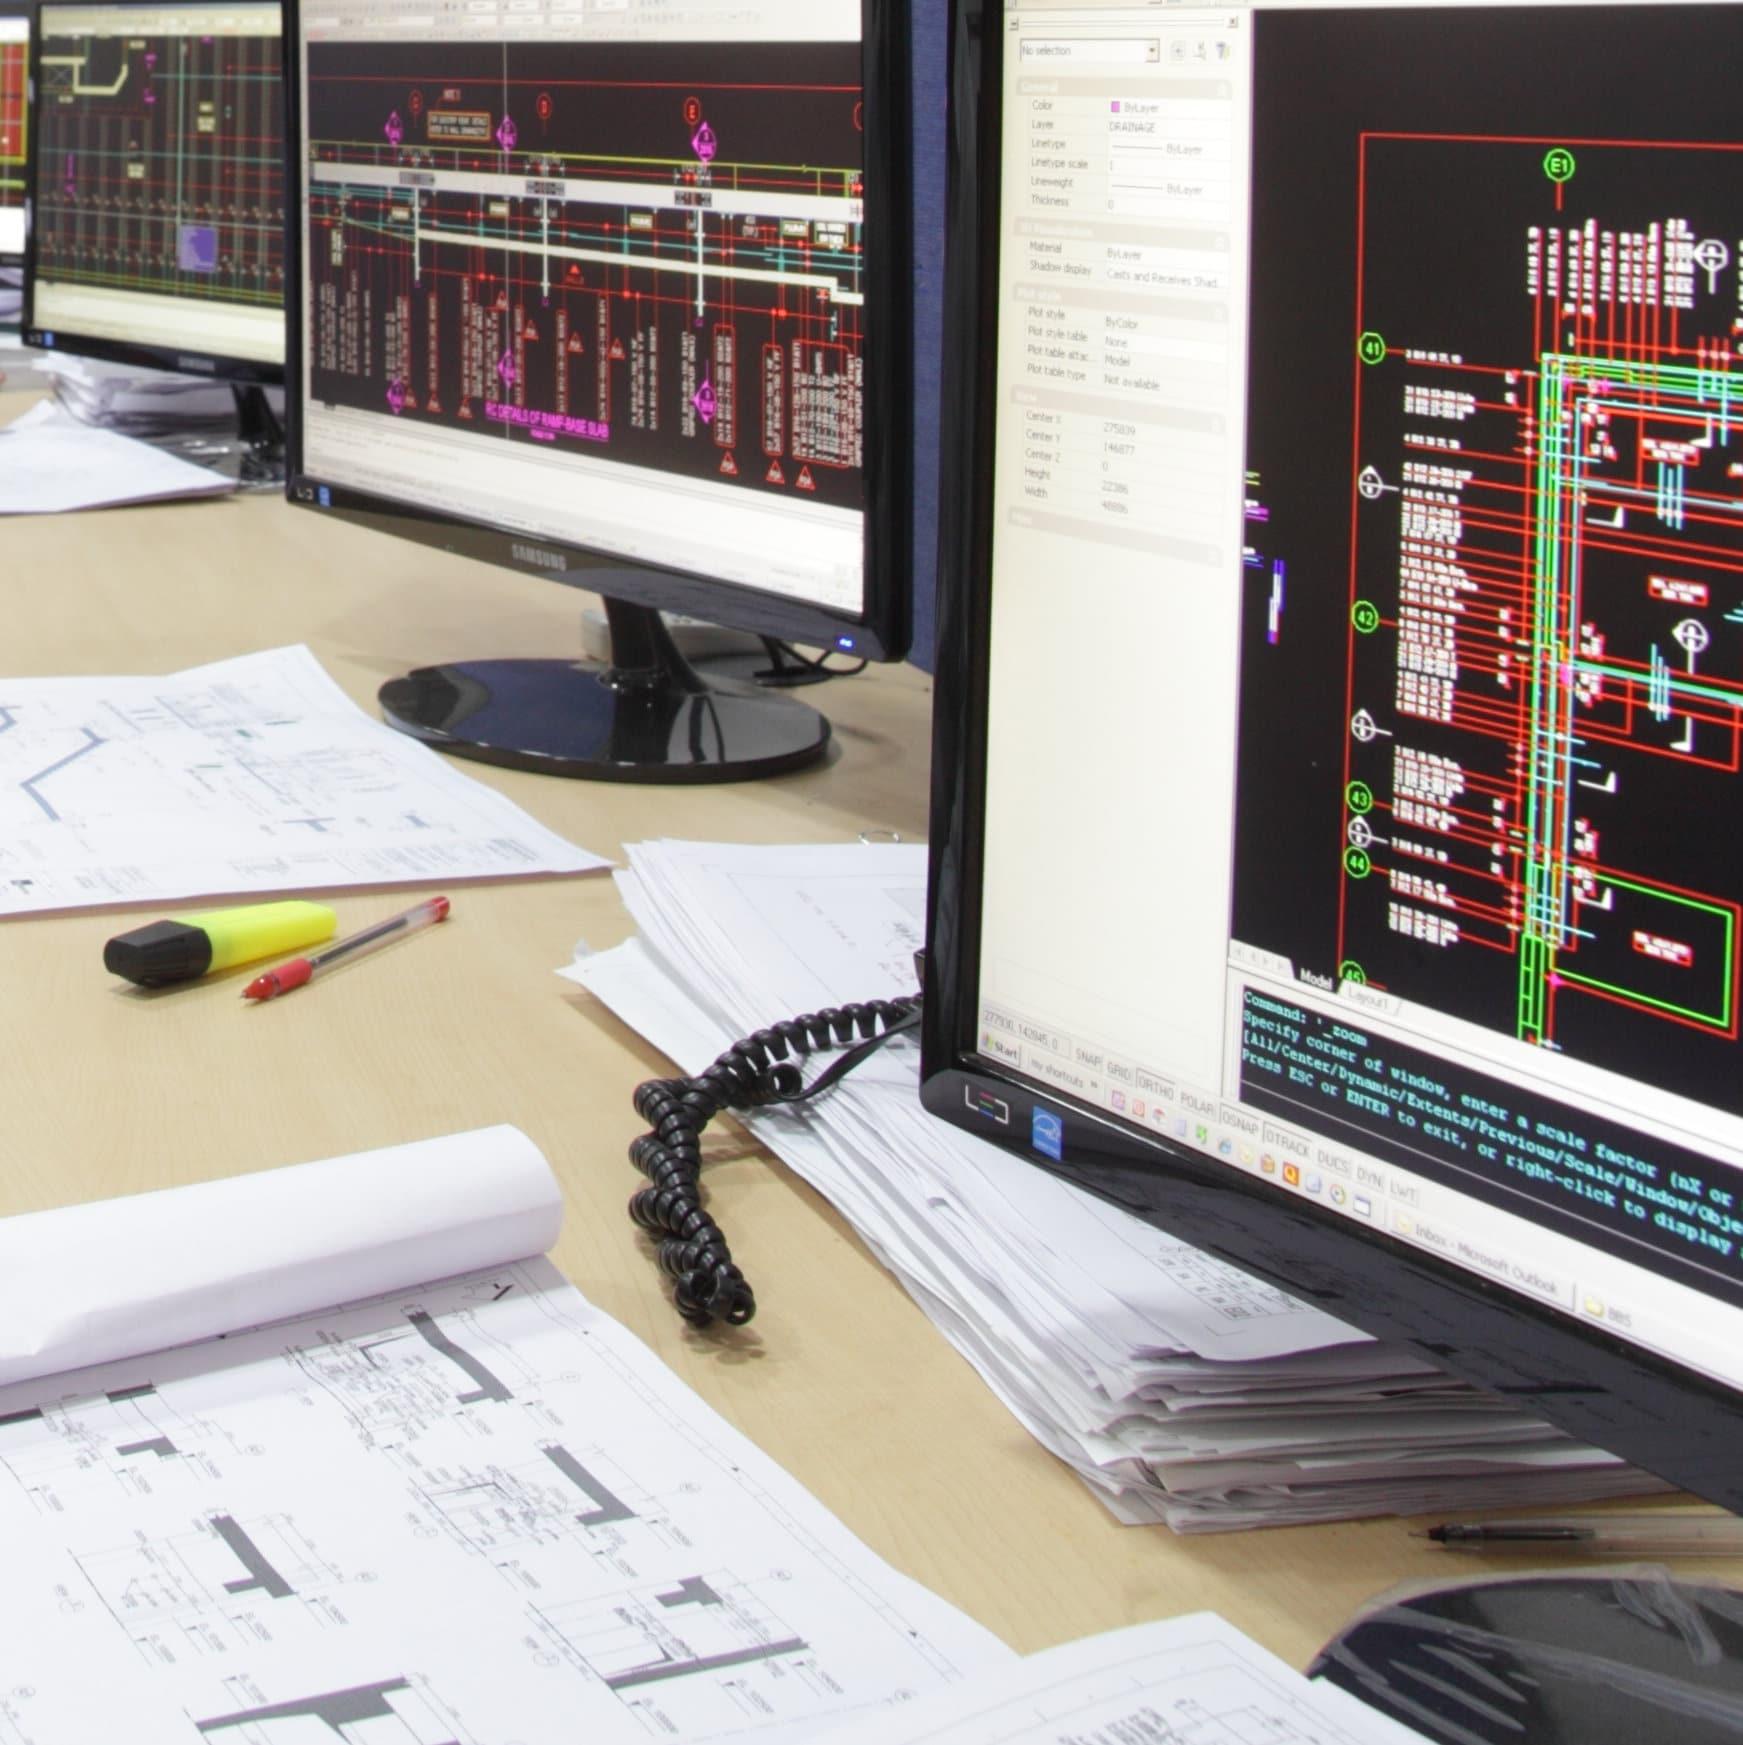 Detailers' computer screens